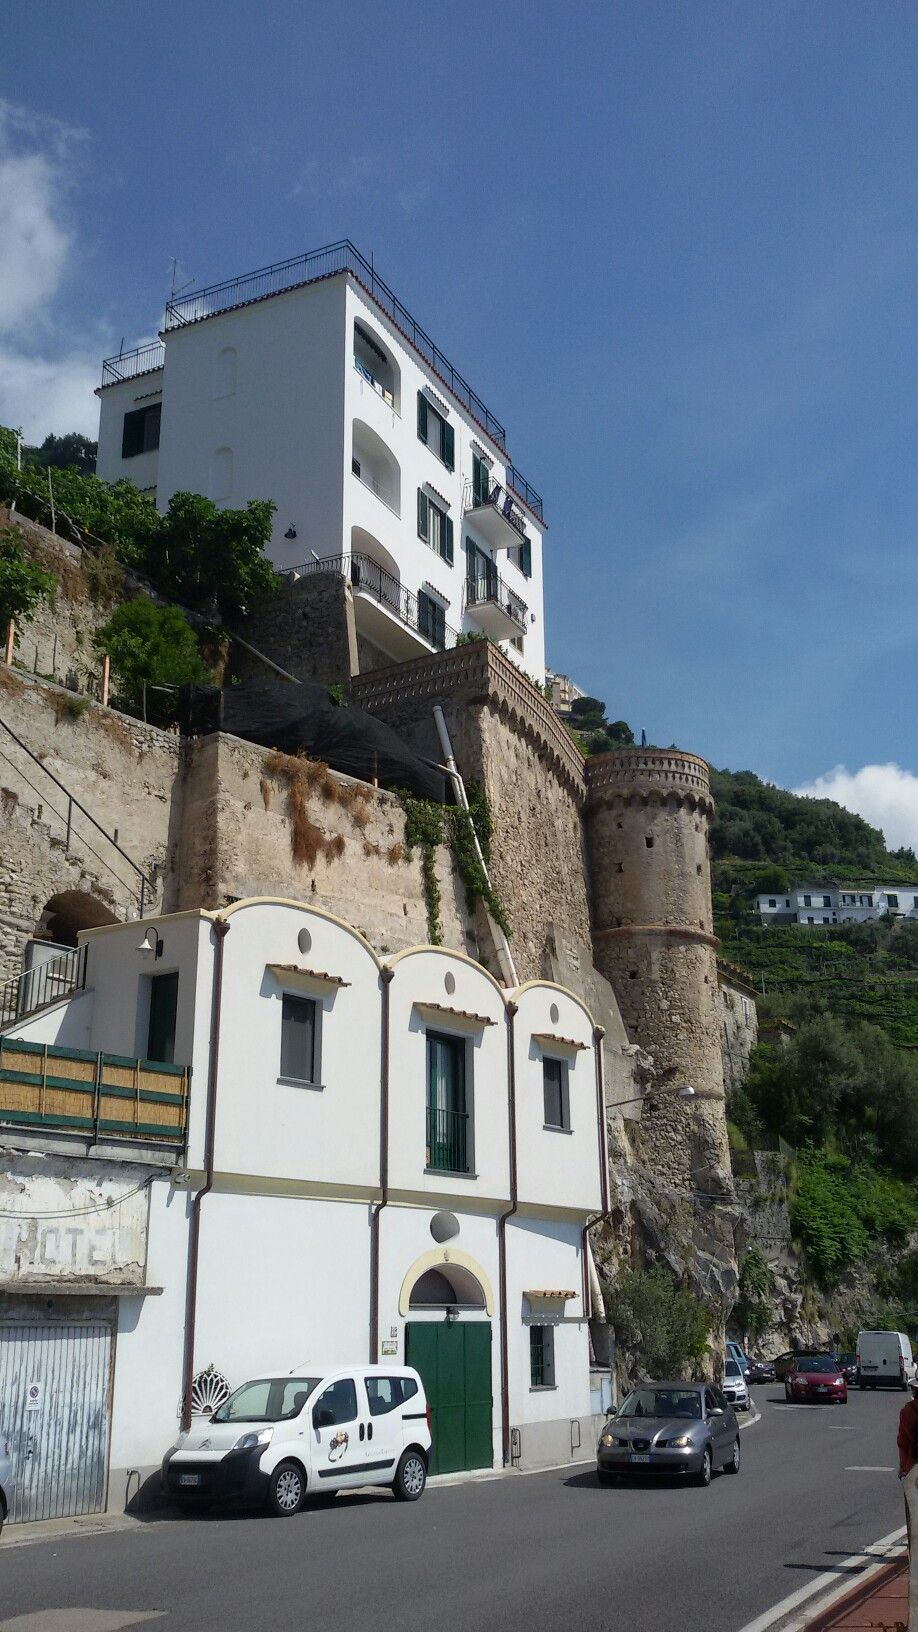 Torre lungo la Costiera Amalfitana